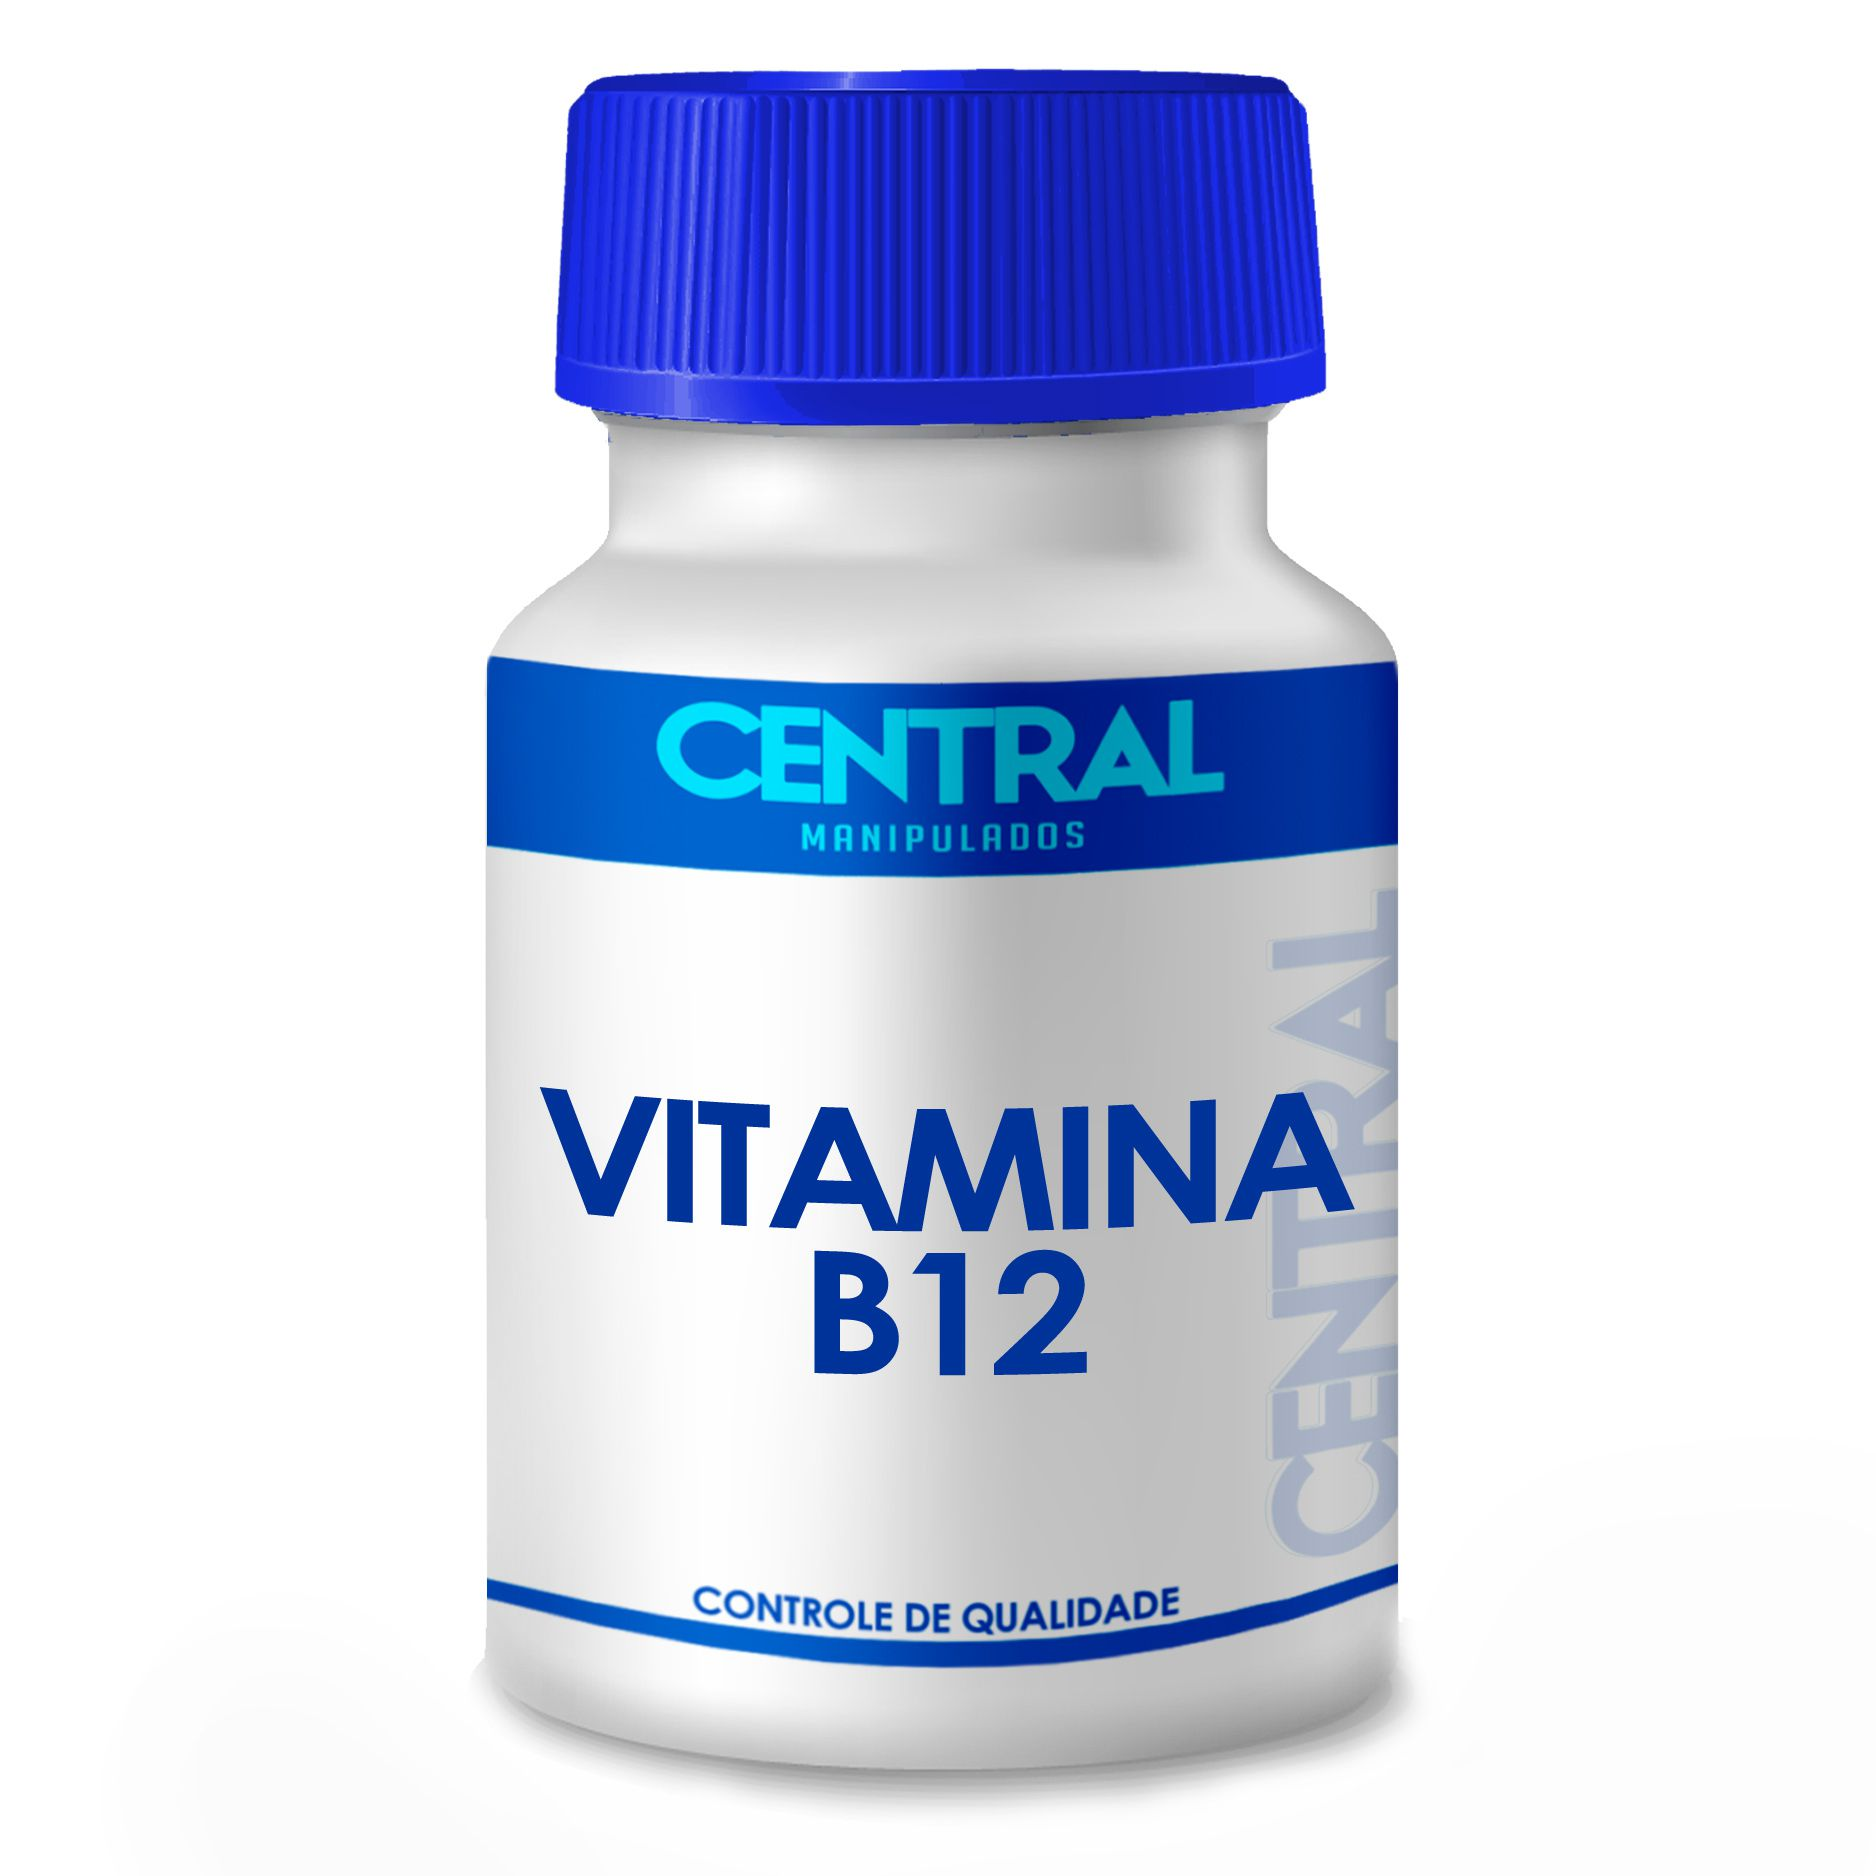 Vitamina B12 - Tratamento de anemia e fortalece o  sistema imunológico - 500mcg 60 Comprimidos Sublingual